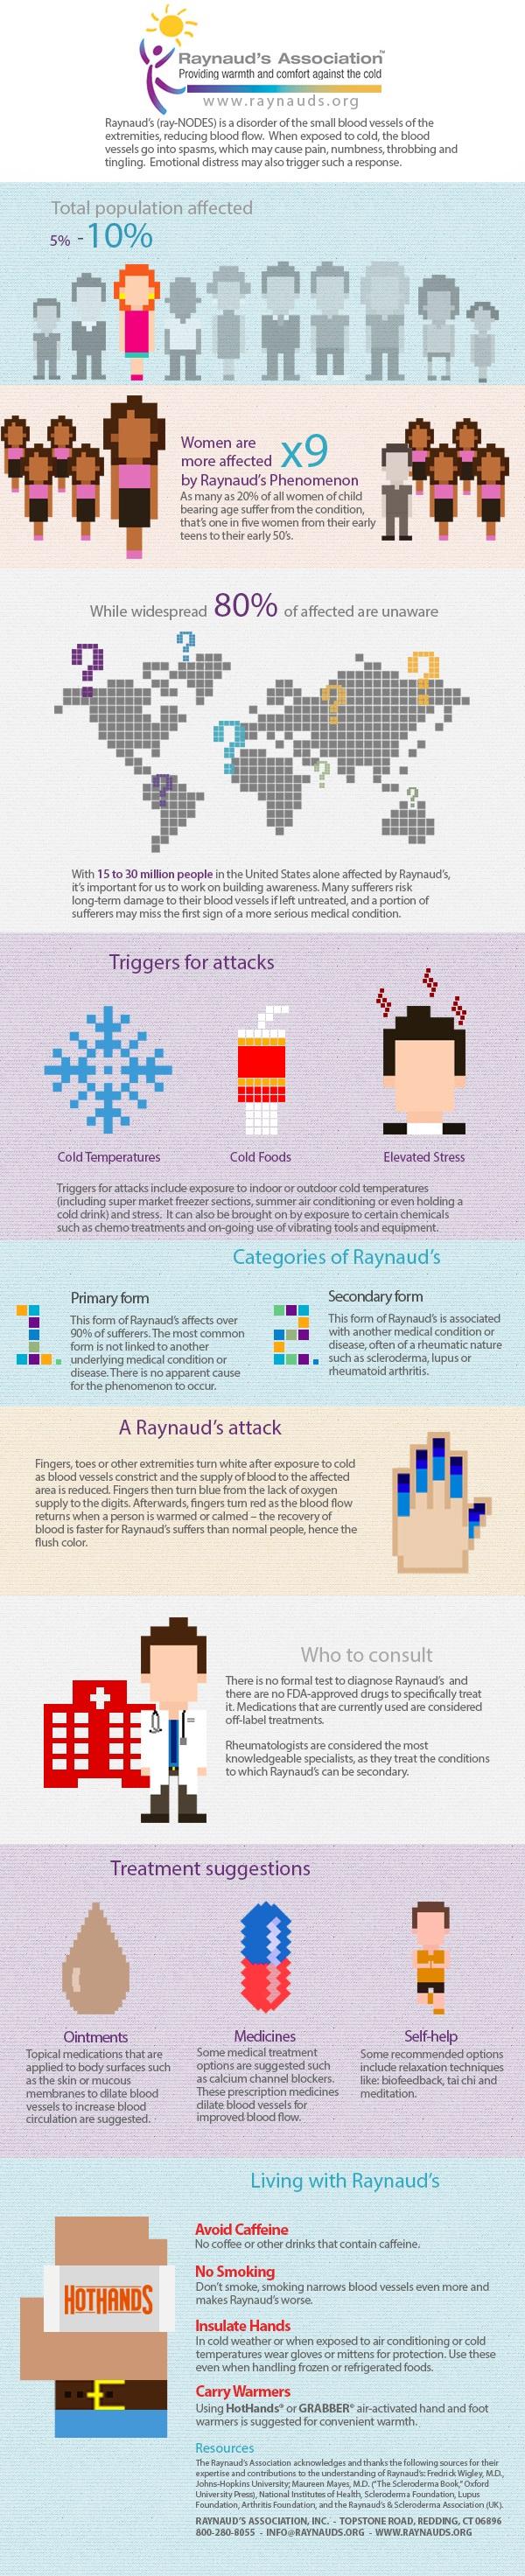 Infographic - Raynaud